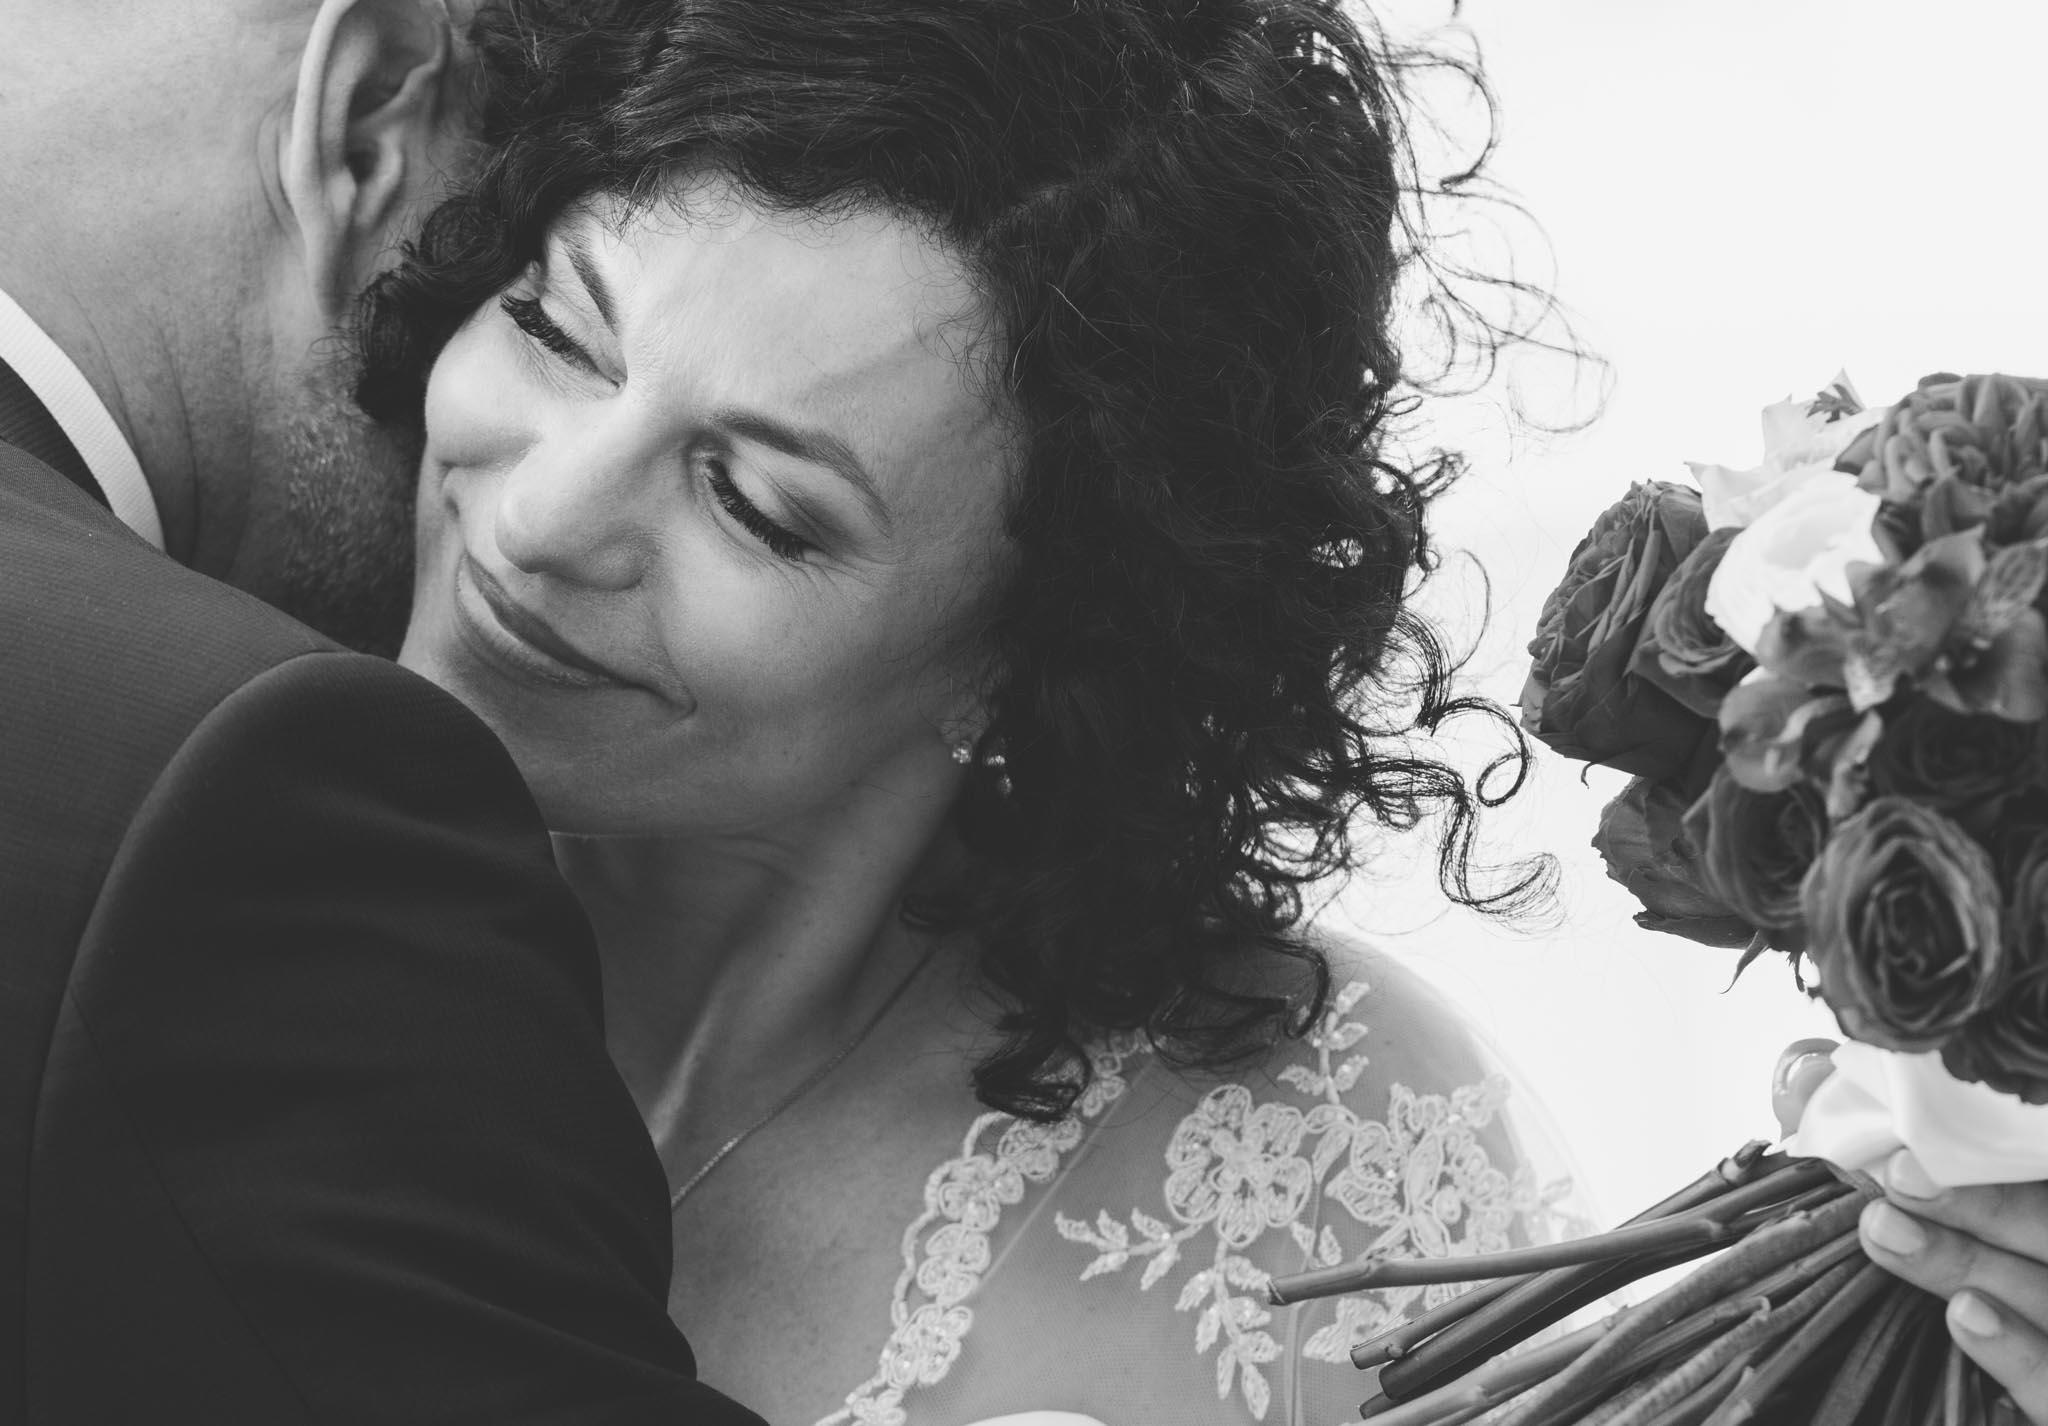 photobooth mariage ,photographe de mariage Dubai,photographe de mariage narbonne,photo mariage couple originale,photographe de mariage narbonne,photographe portrait toulouse,photographe de mariage ,photographe de mariage loire,photographe portrait toulouse,photographe de mariage grenoble,photographe portrait toulouse,photographe professionnel pour mariage,photographe de mariages,photographe de mariage loire,photographe de mariage drome,photographe de mariage,photographe de mariage juif,photographe de mariage pas cher,photographe de mariage grenoble,photographe portrait toulouse,photographe professionnel pour mariage,photographe de mariage,photographe de mariage juif,photographe de mariage pas cher,photographe cameraman mariage oriental,photographe de mariage dijon,photographe de mariage isére,photo mariage professionnel,photographe évenementiel,photographe de mariage oriental,photographe de mariage ardeche,photographe de mariage grenoble,photographe pour mariage pas cher,photographe de mariage ardeche,photographe de mariage grenoble,photographe pour mariage pas cher,photographe de mariage ,photographe de mariage loire,photographe portrait toulouse,photographe  mariage,photographe de mariage toulouse,photographe professionnel tarif,photographe de mariages,photographe de mariage original,photographe de mariage Dubai,photographe de mariage prix,photographe de mariage juif,photographe de mariage Geneva,photographe de mariages,photographe de mariage loire,photographe de mariage drome